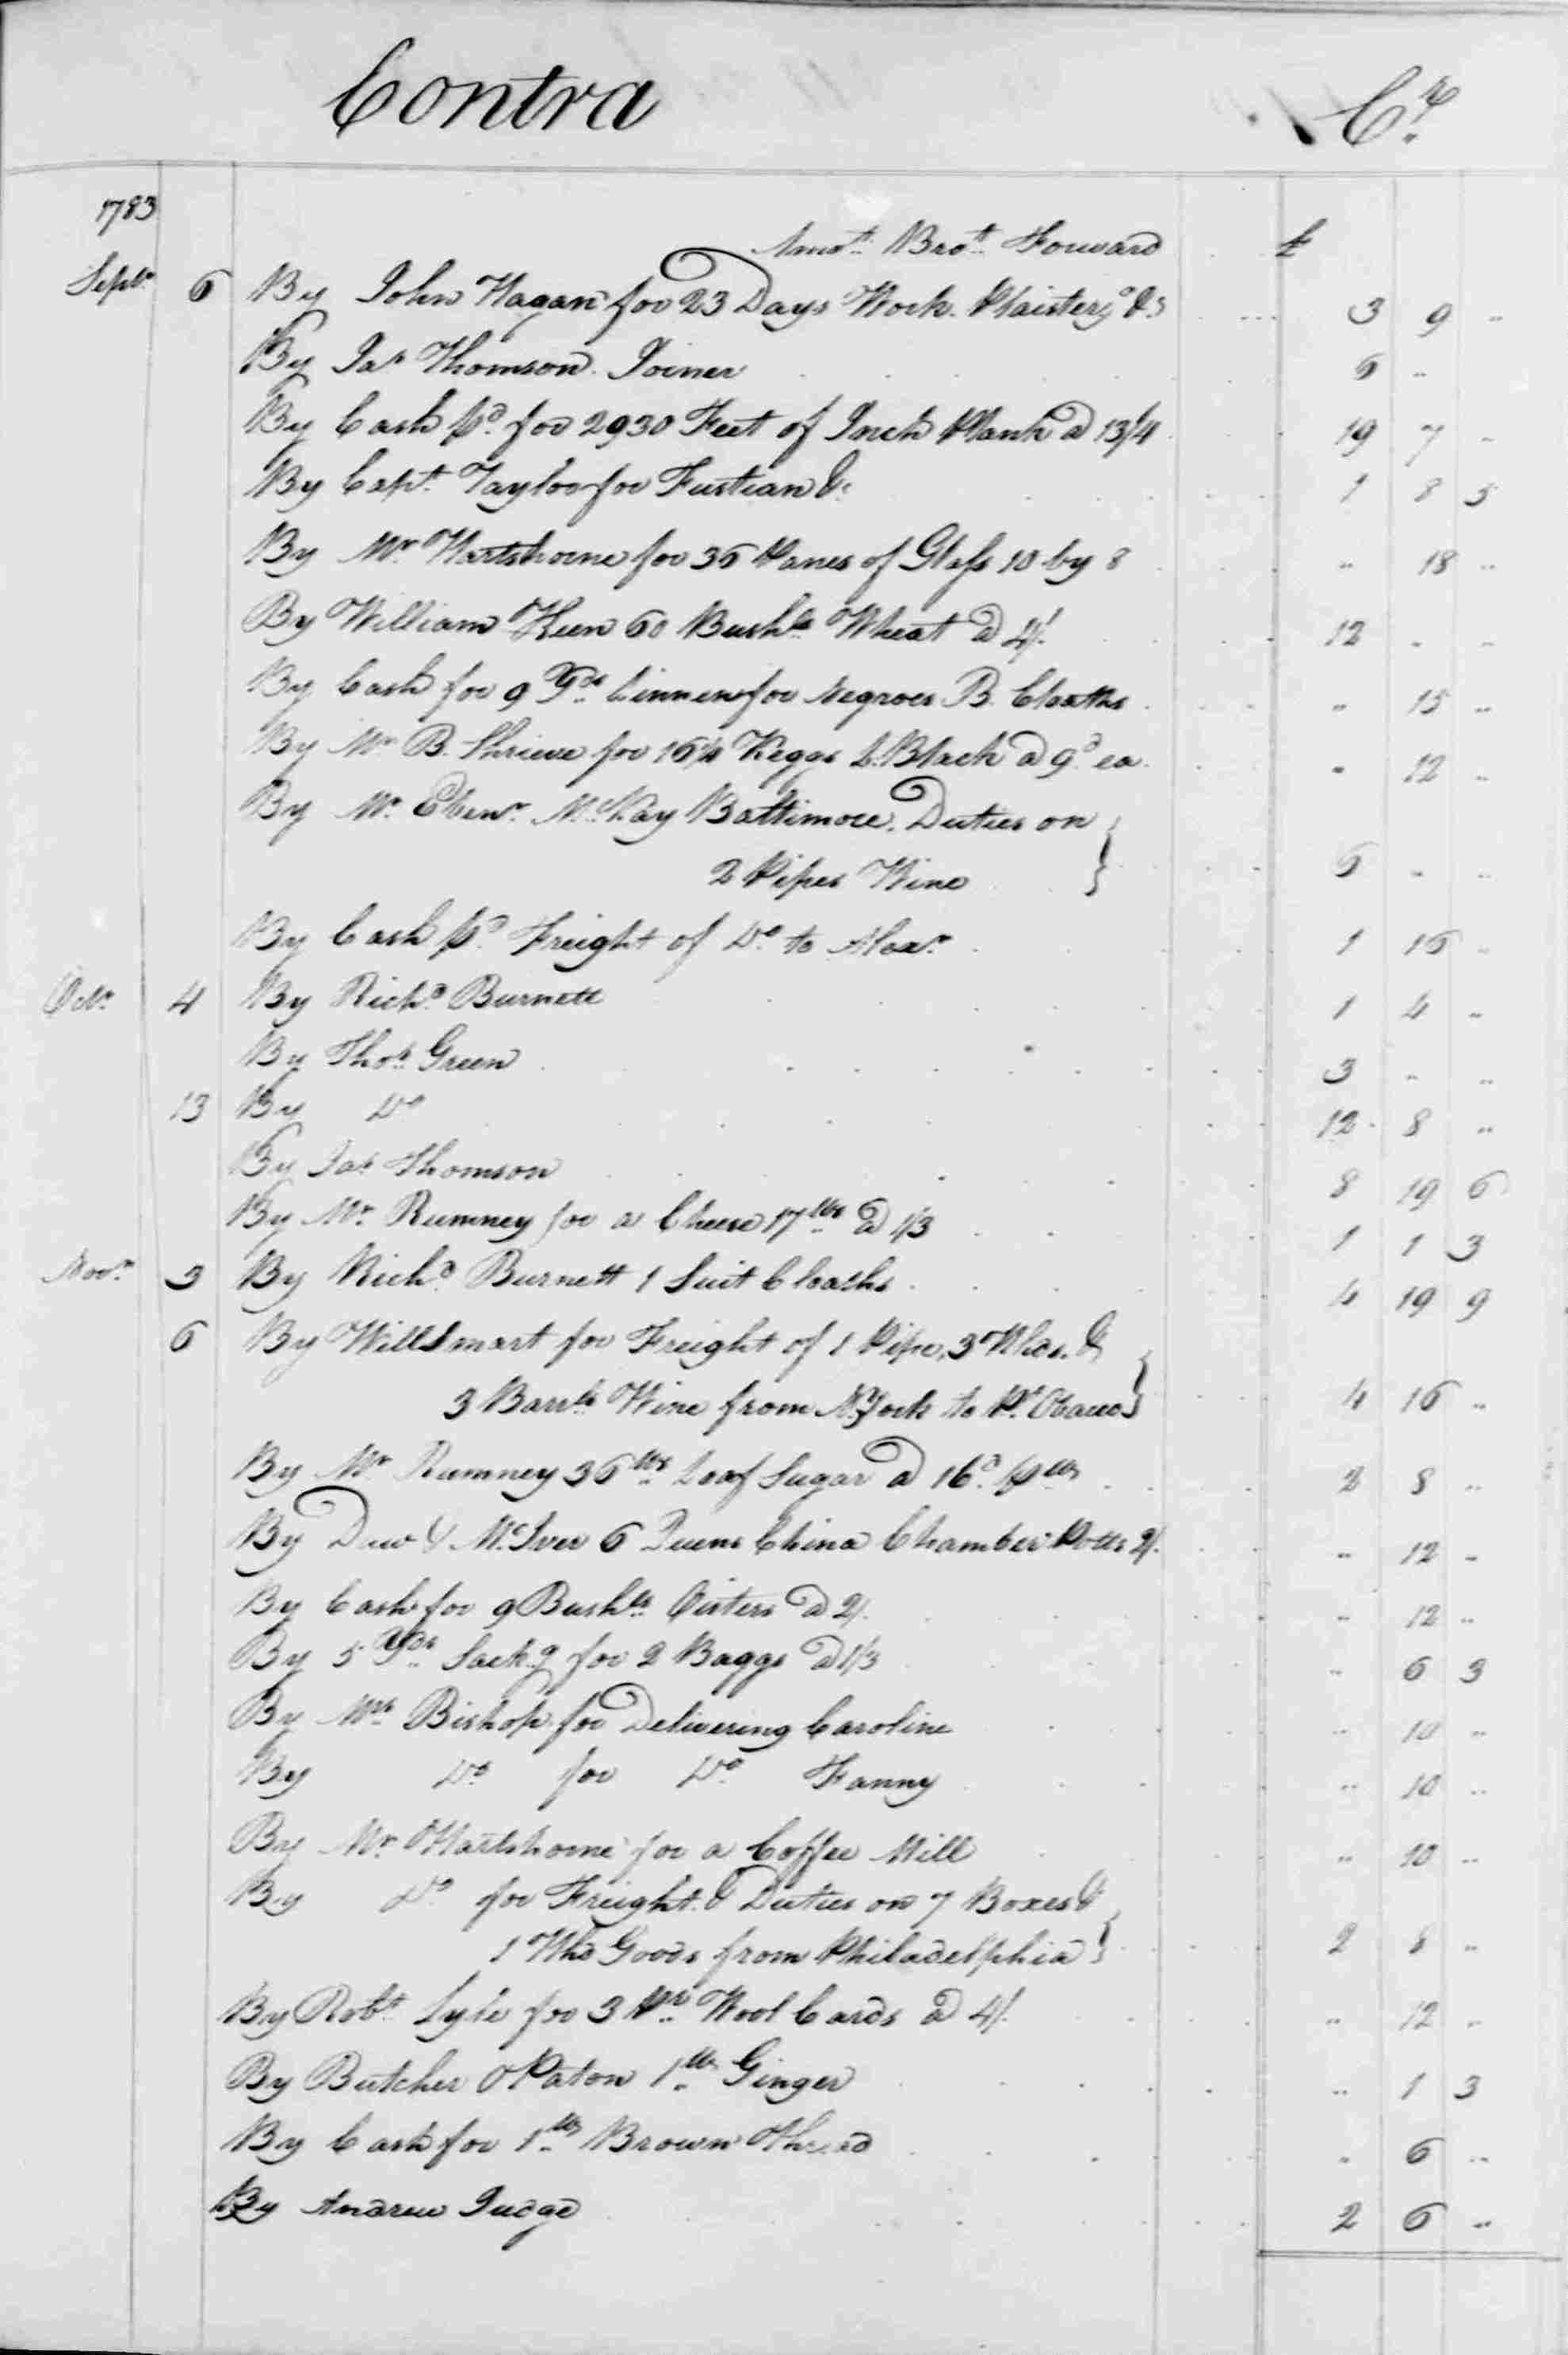 Ledger B, folio 174, right side